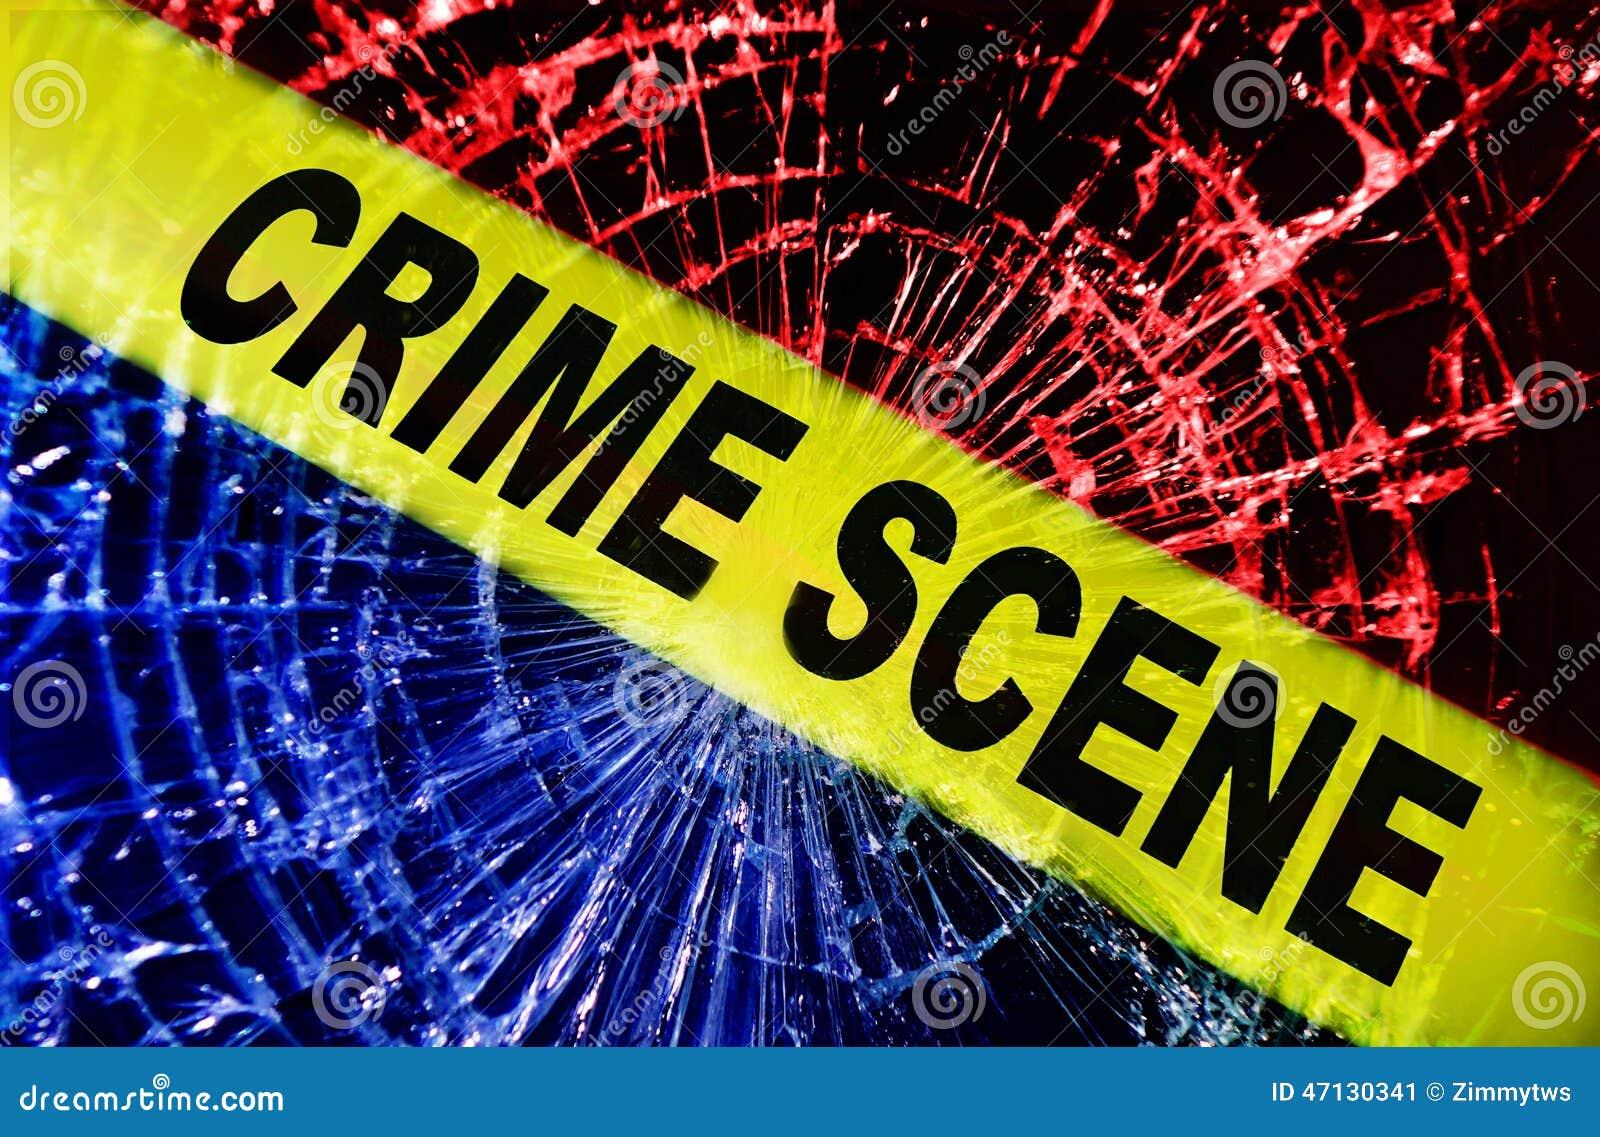 broken window crime scene stock photo